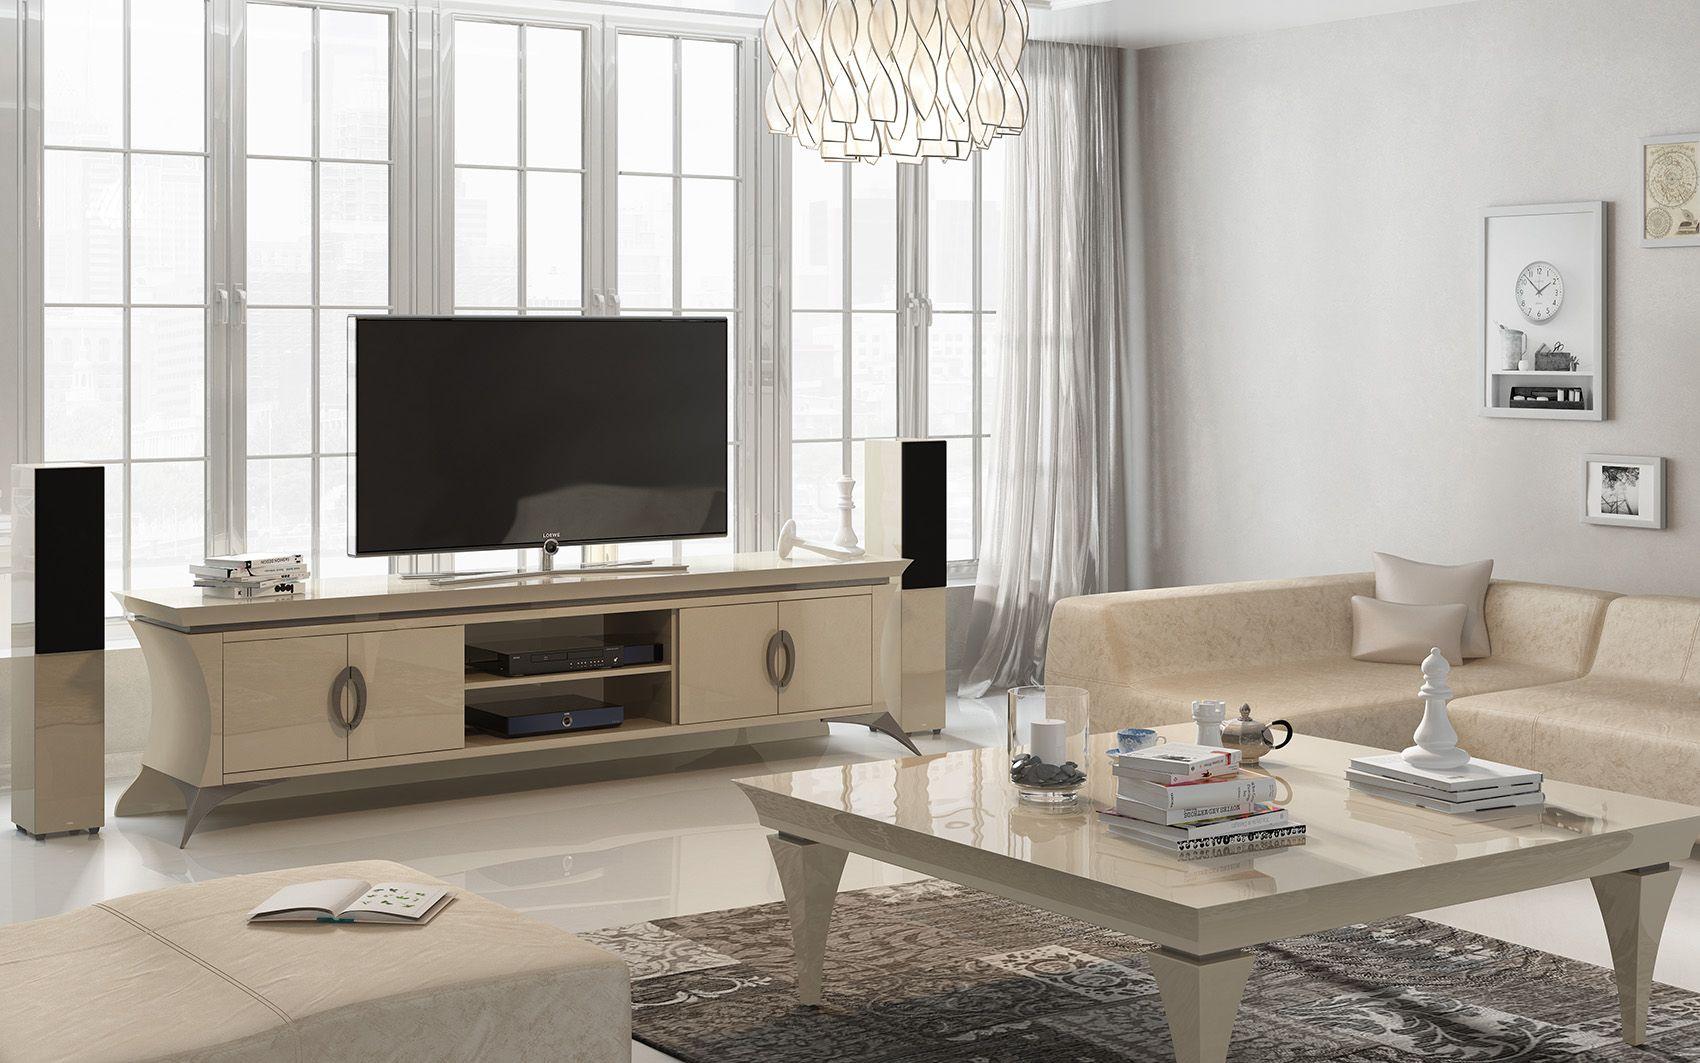 Mueble Tv Imperial Tv Mueble Wallunittv Www Francofurniture Es  # Muebles Mia Lucena